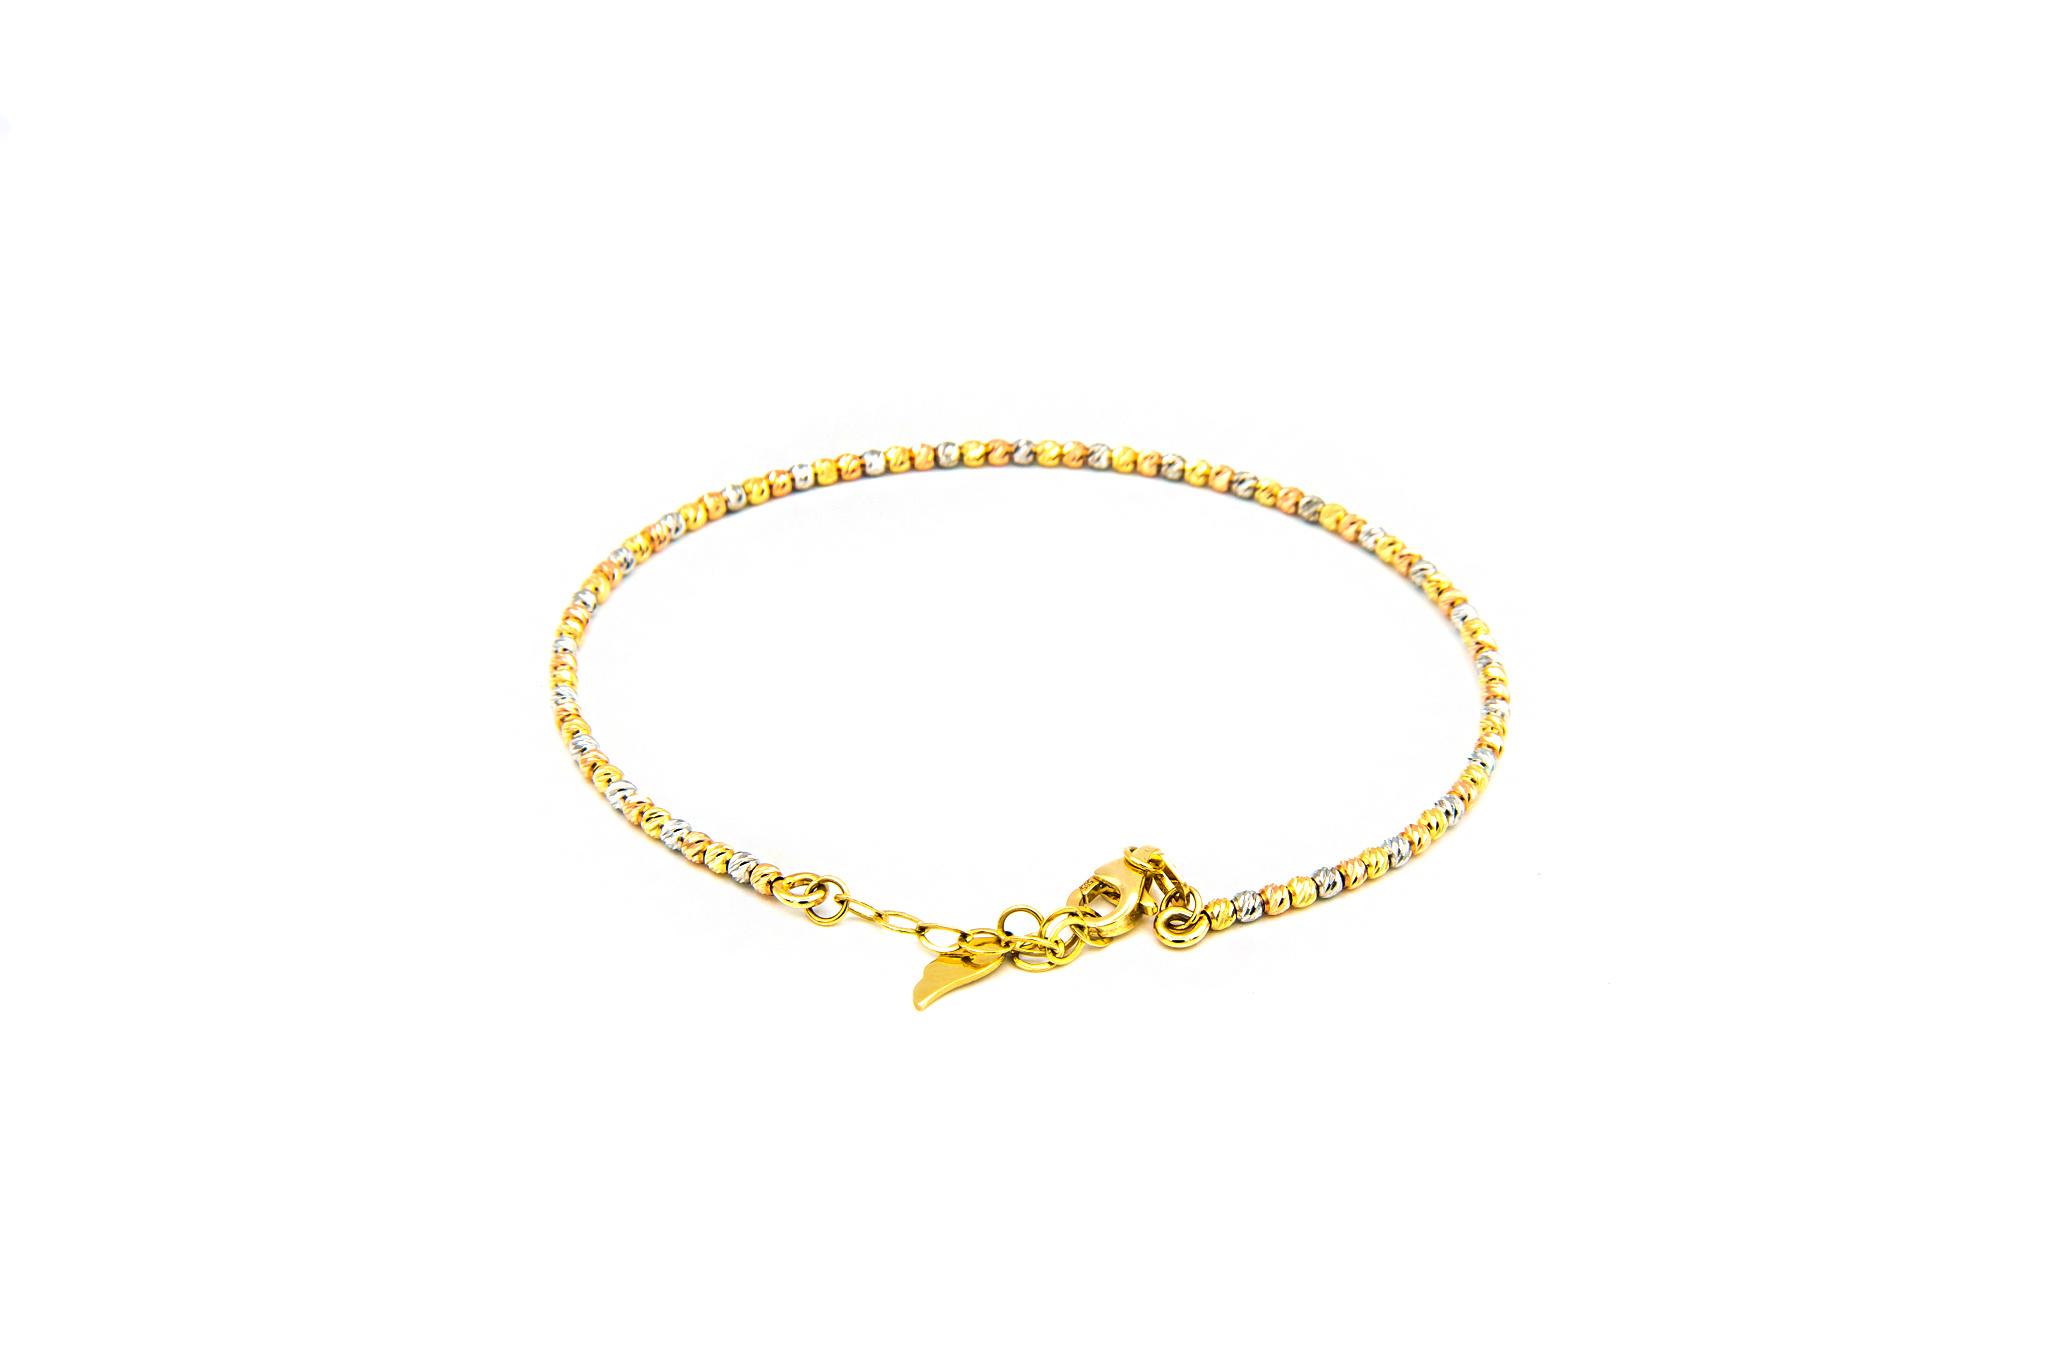 Armband vast diamond cut balletjes tricolor-3